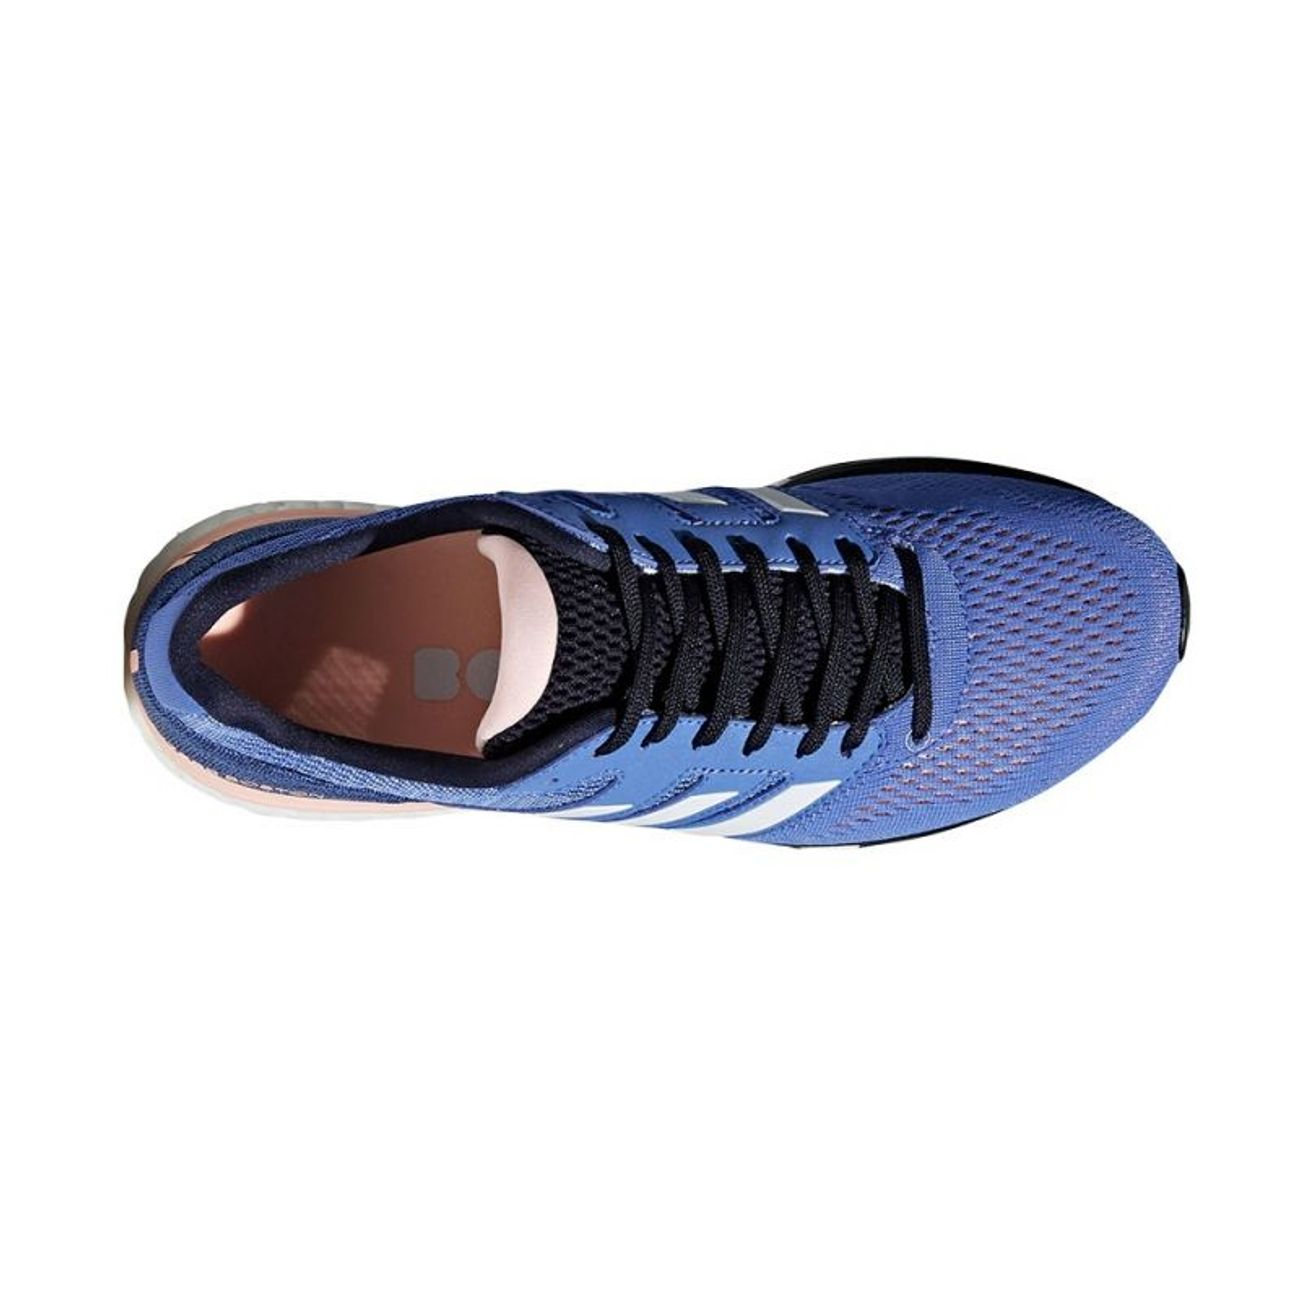 wholesale dealer 74bd4 4829c ... running femme ADIDAS Adidas - adizero Boston 7 Femmes chaussure de  course (pourpre) ...